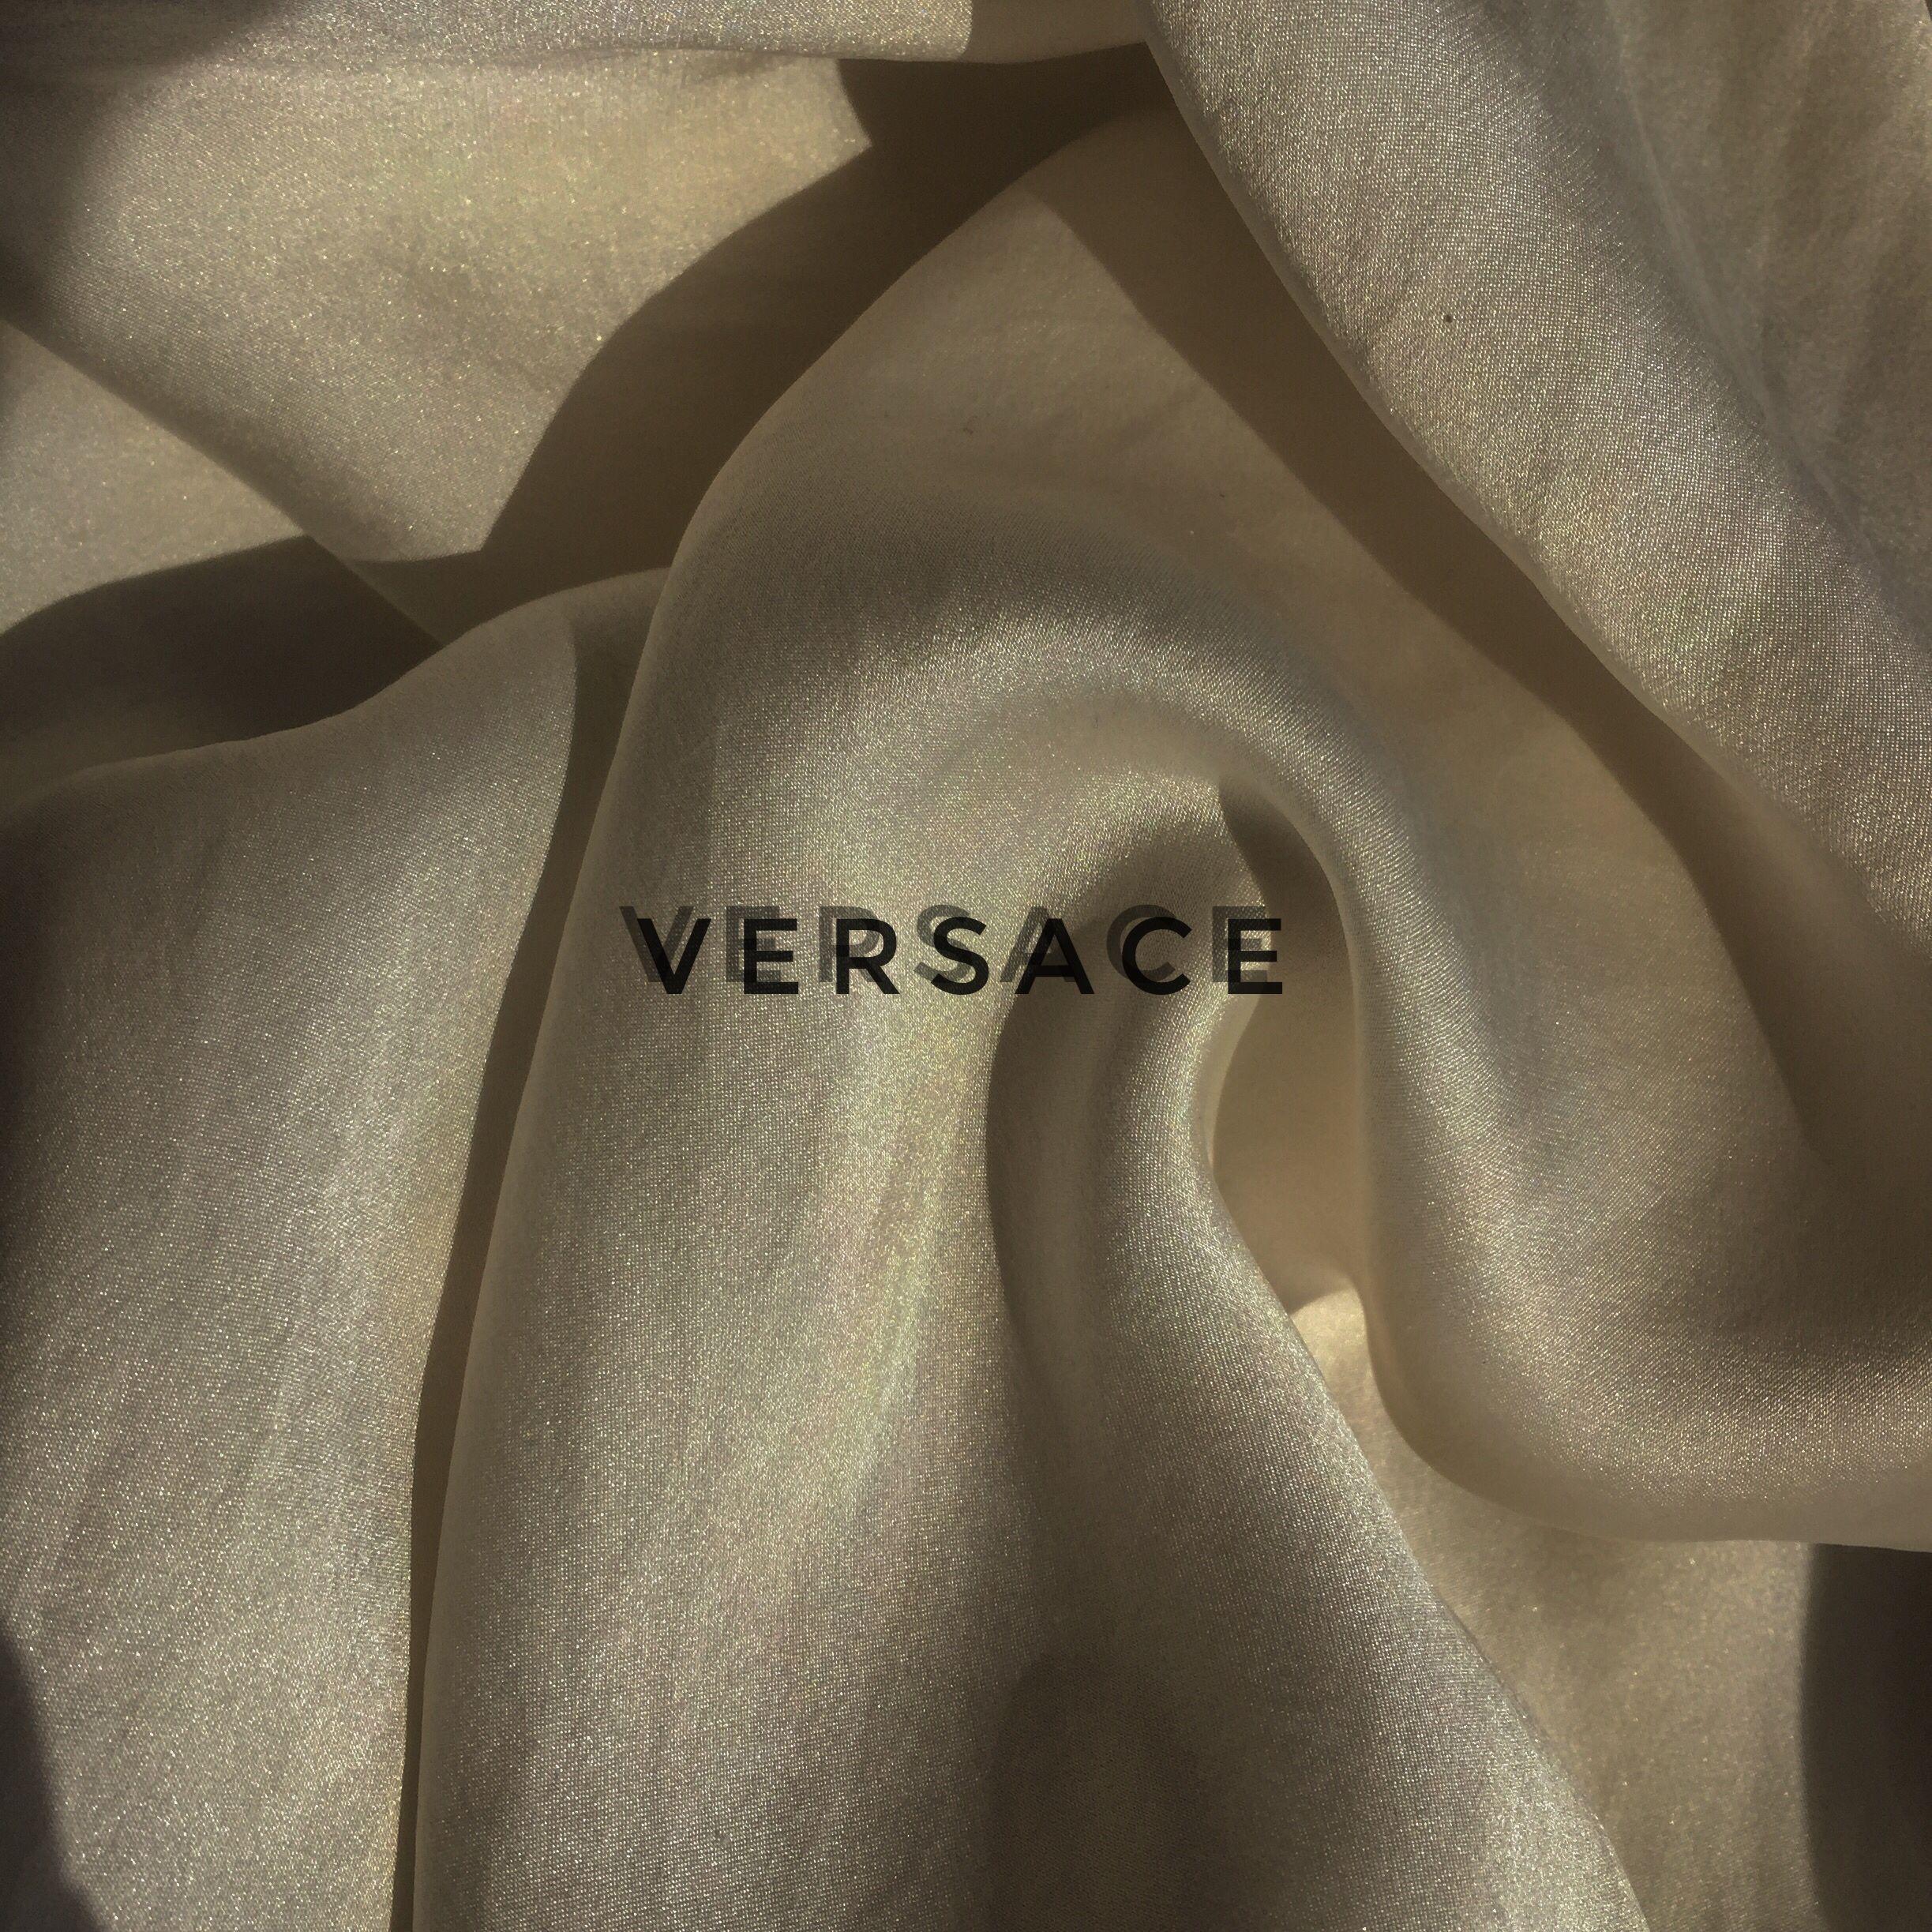 Versace Aesthetic Versace aesthetic #versace #aest